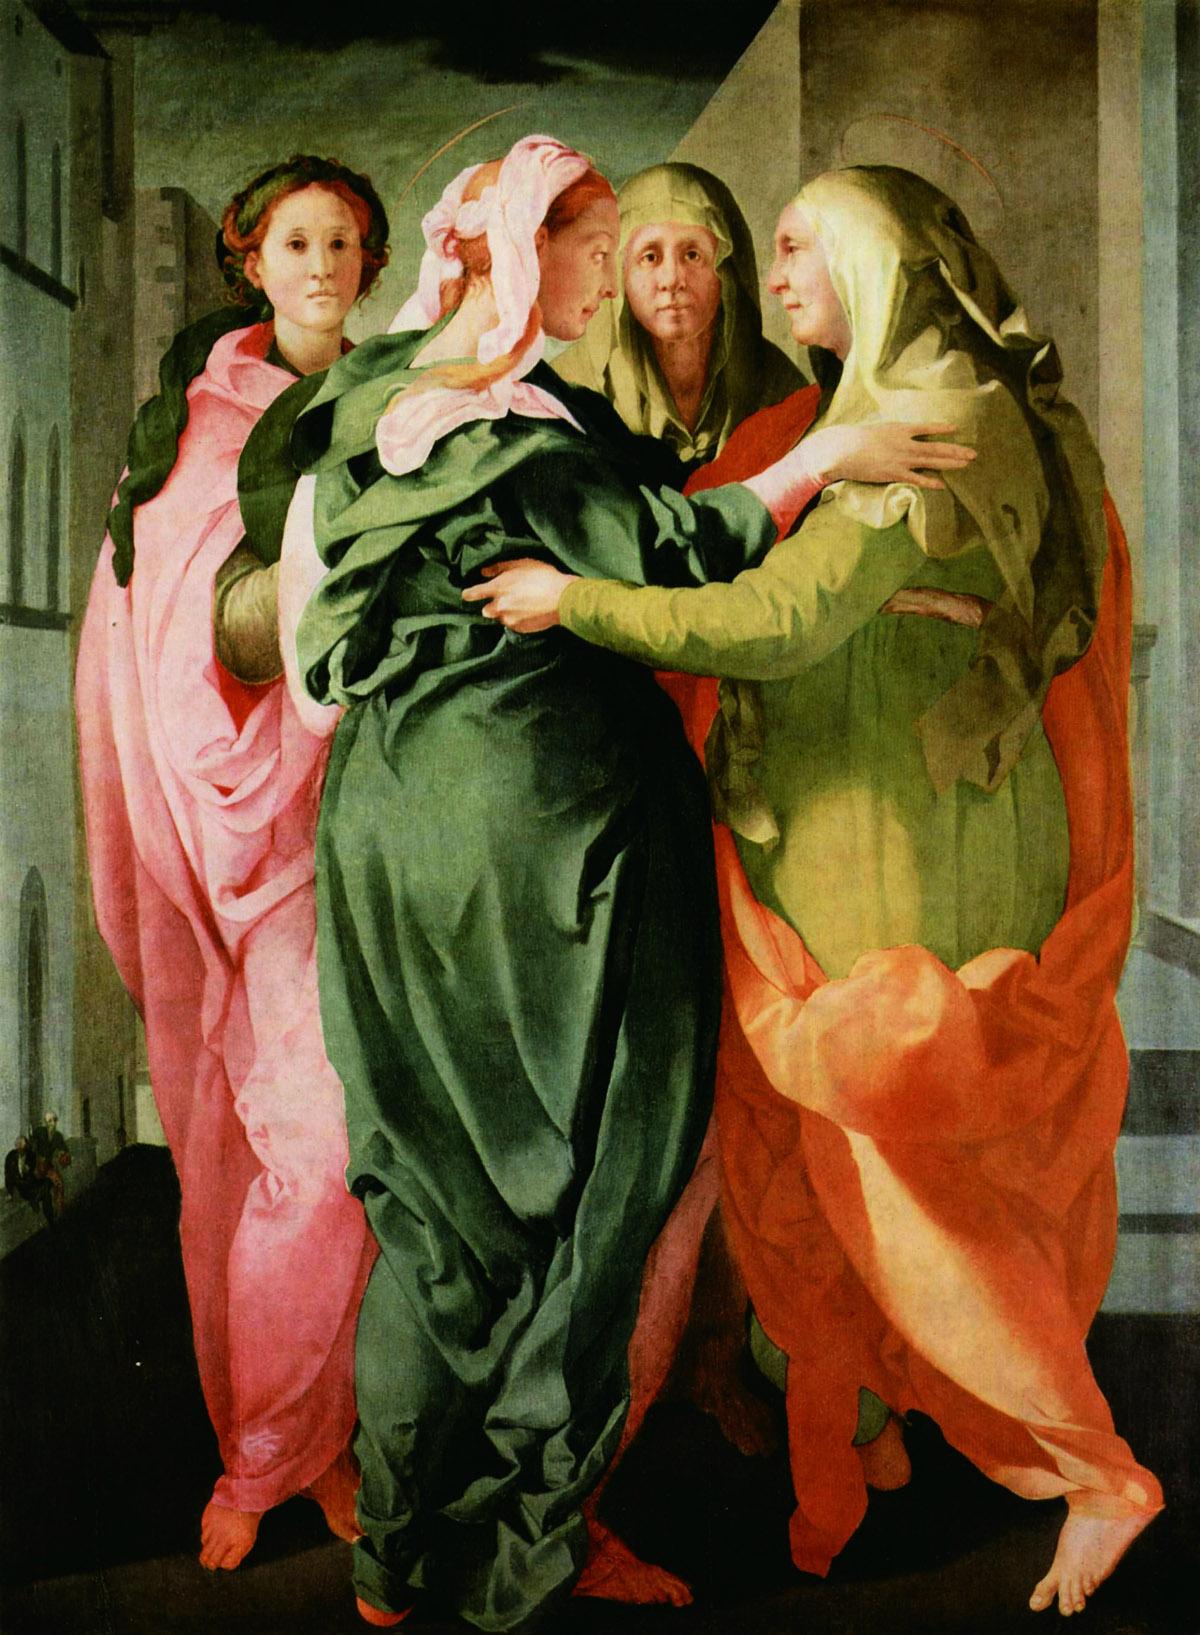 Pontormo, Visitazione 1528-29 ca. Olio su tavola, cm 207 x 159,4. Carmignano, Pieve di San Michele Arcangelo. Photo Antonio Quattrone